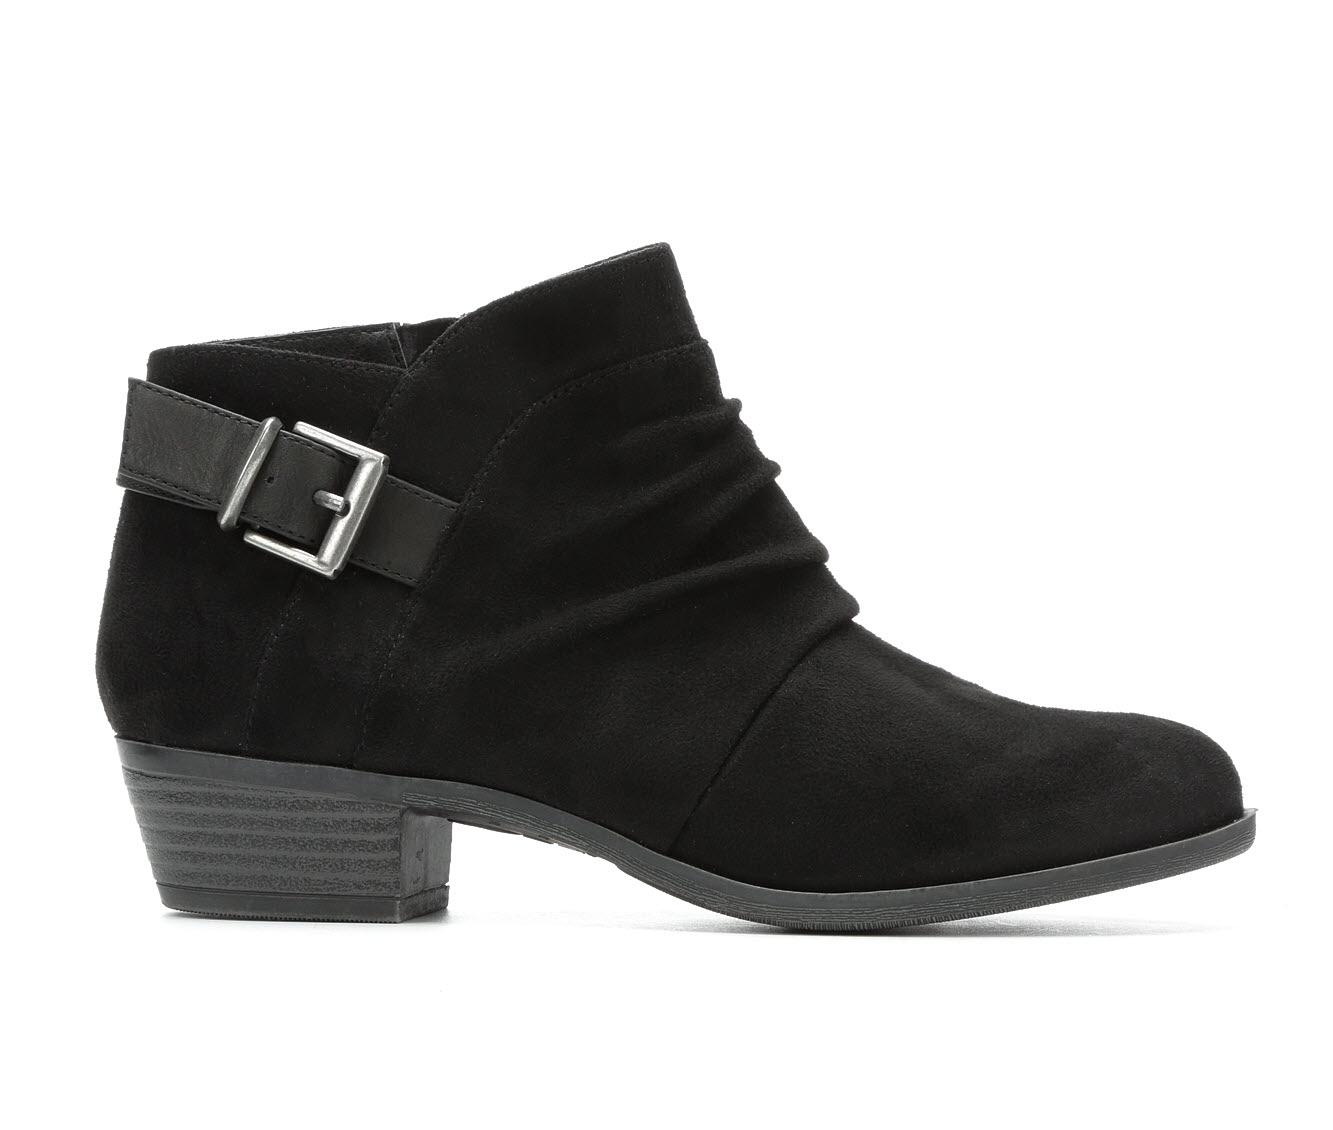 No Parking Ailey Women's Boots (Black - Faux Leather)